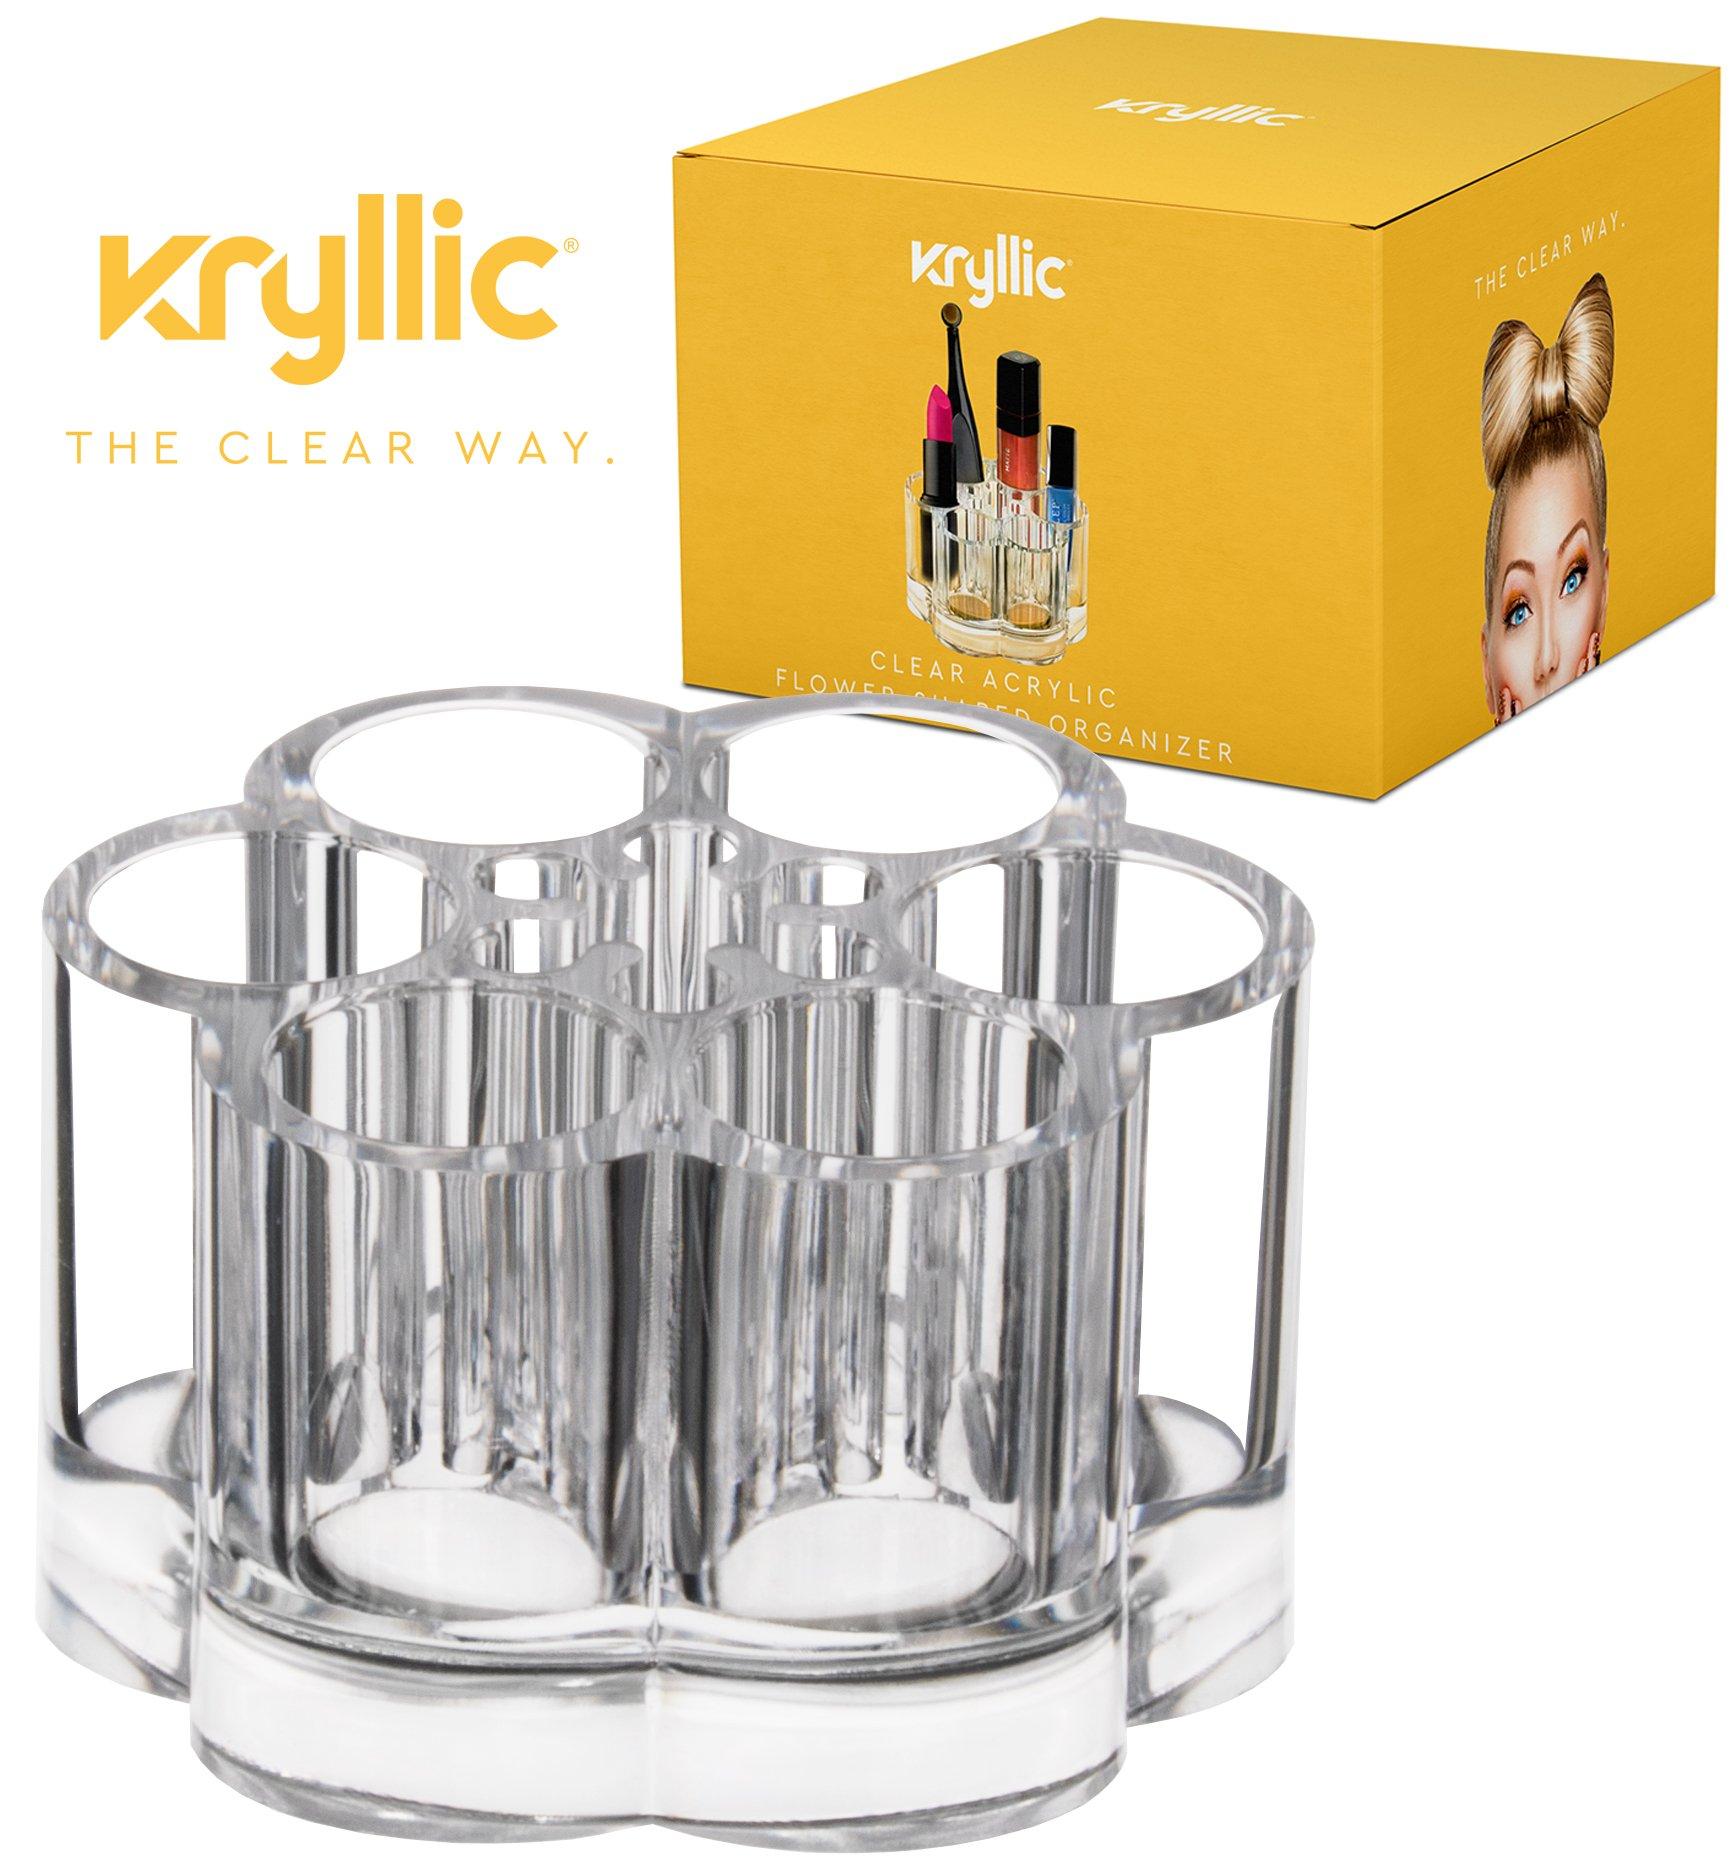 Acrylic Makeup Organizer, Flower Shaped Cosmetic Holder, 7 Slots, By Kryllic